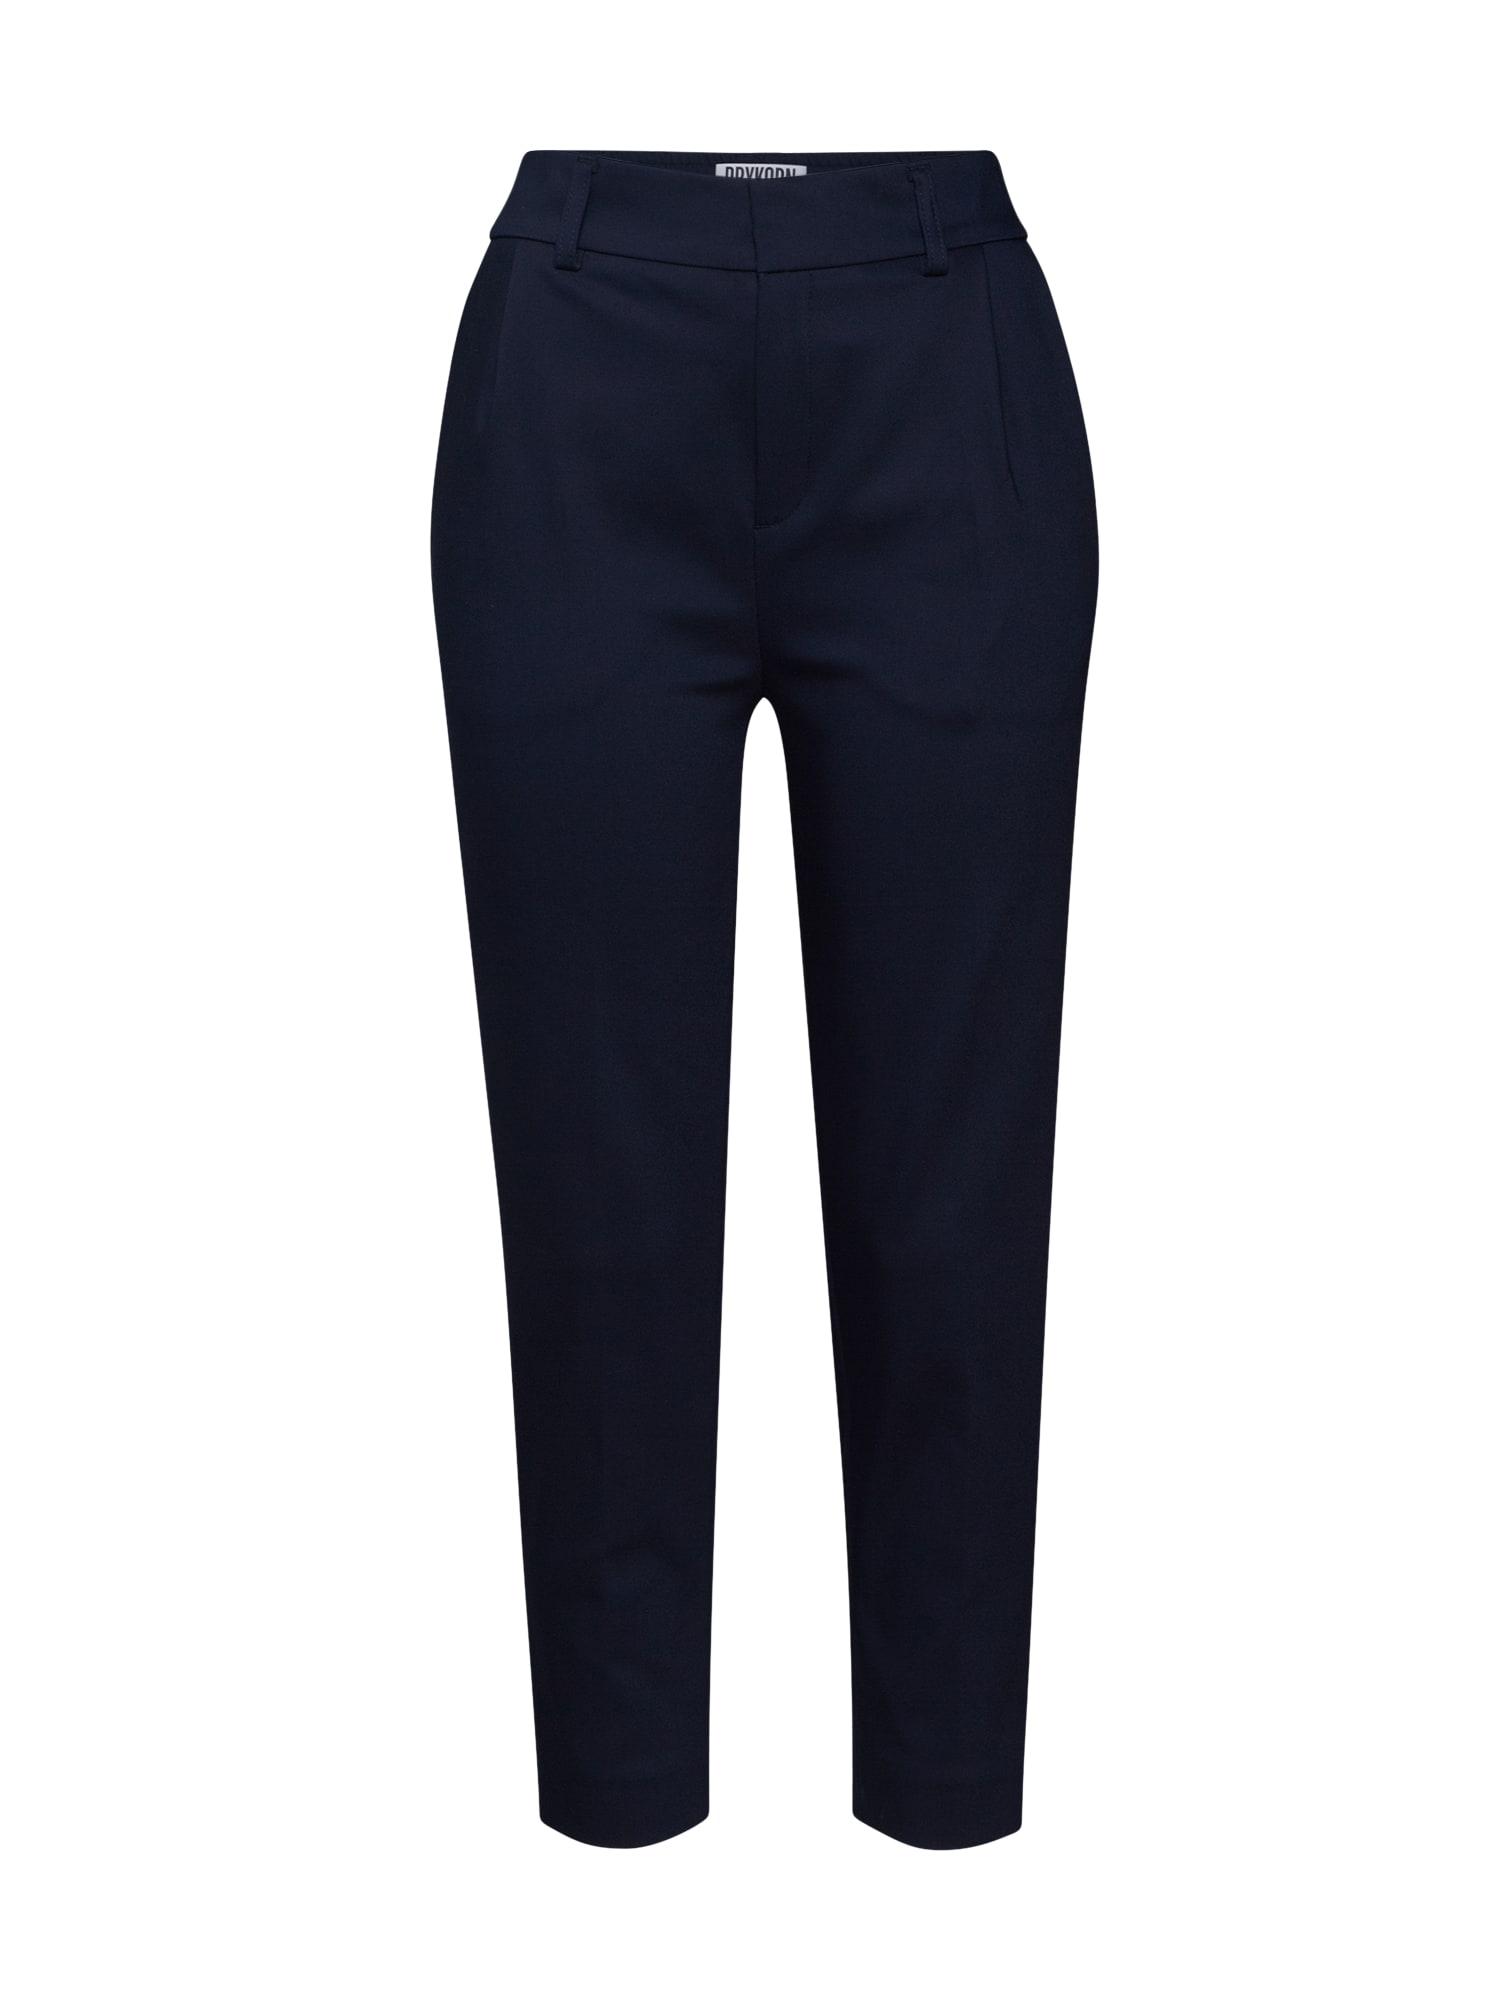 DRYKORN Chino stiliaus kelnės 'FIND' tamsiai mėlyna